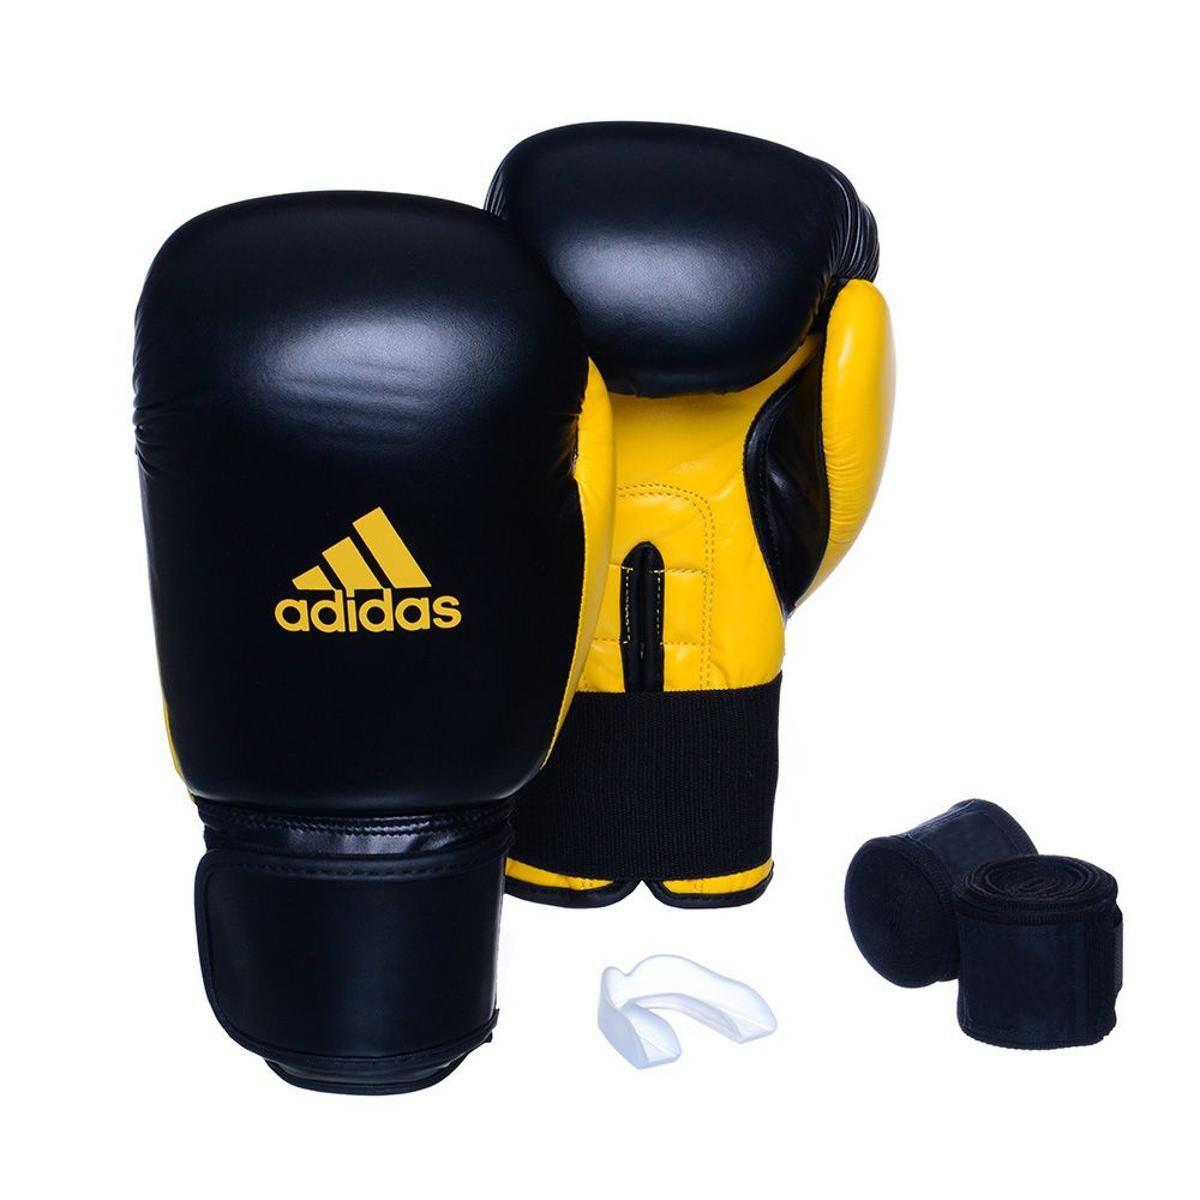 Kit Luvas Boxe / Muay Thai - Adidas Power 100 - Preta / Amarelo - 10/12/14 OZ